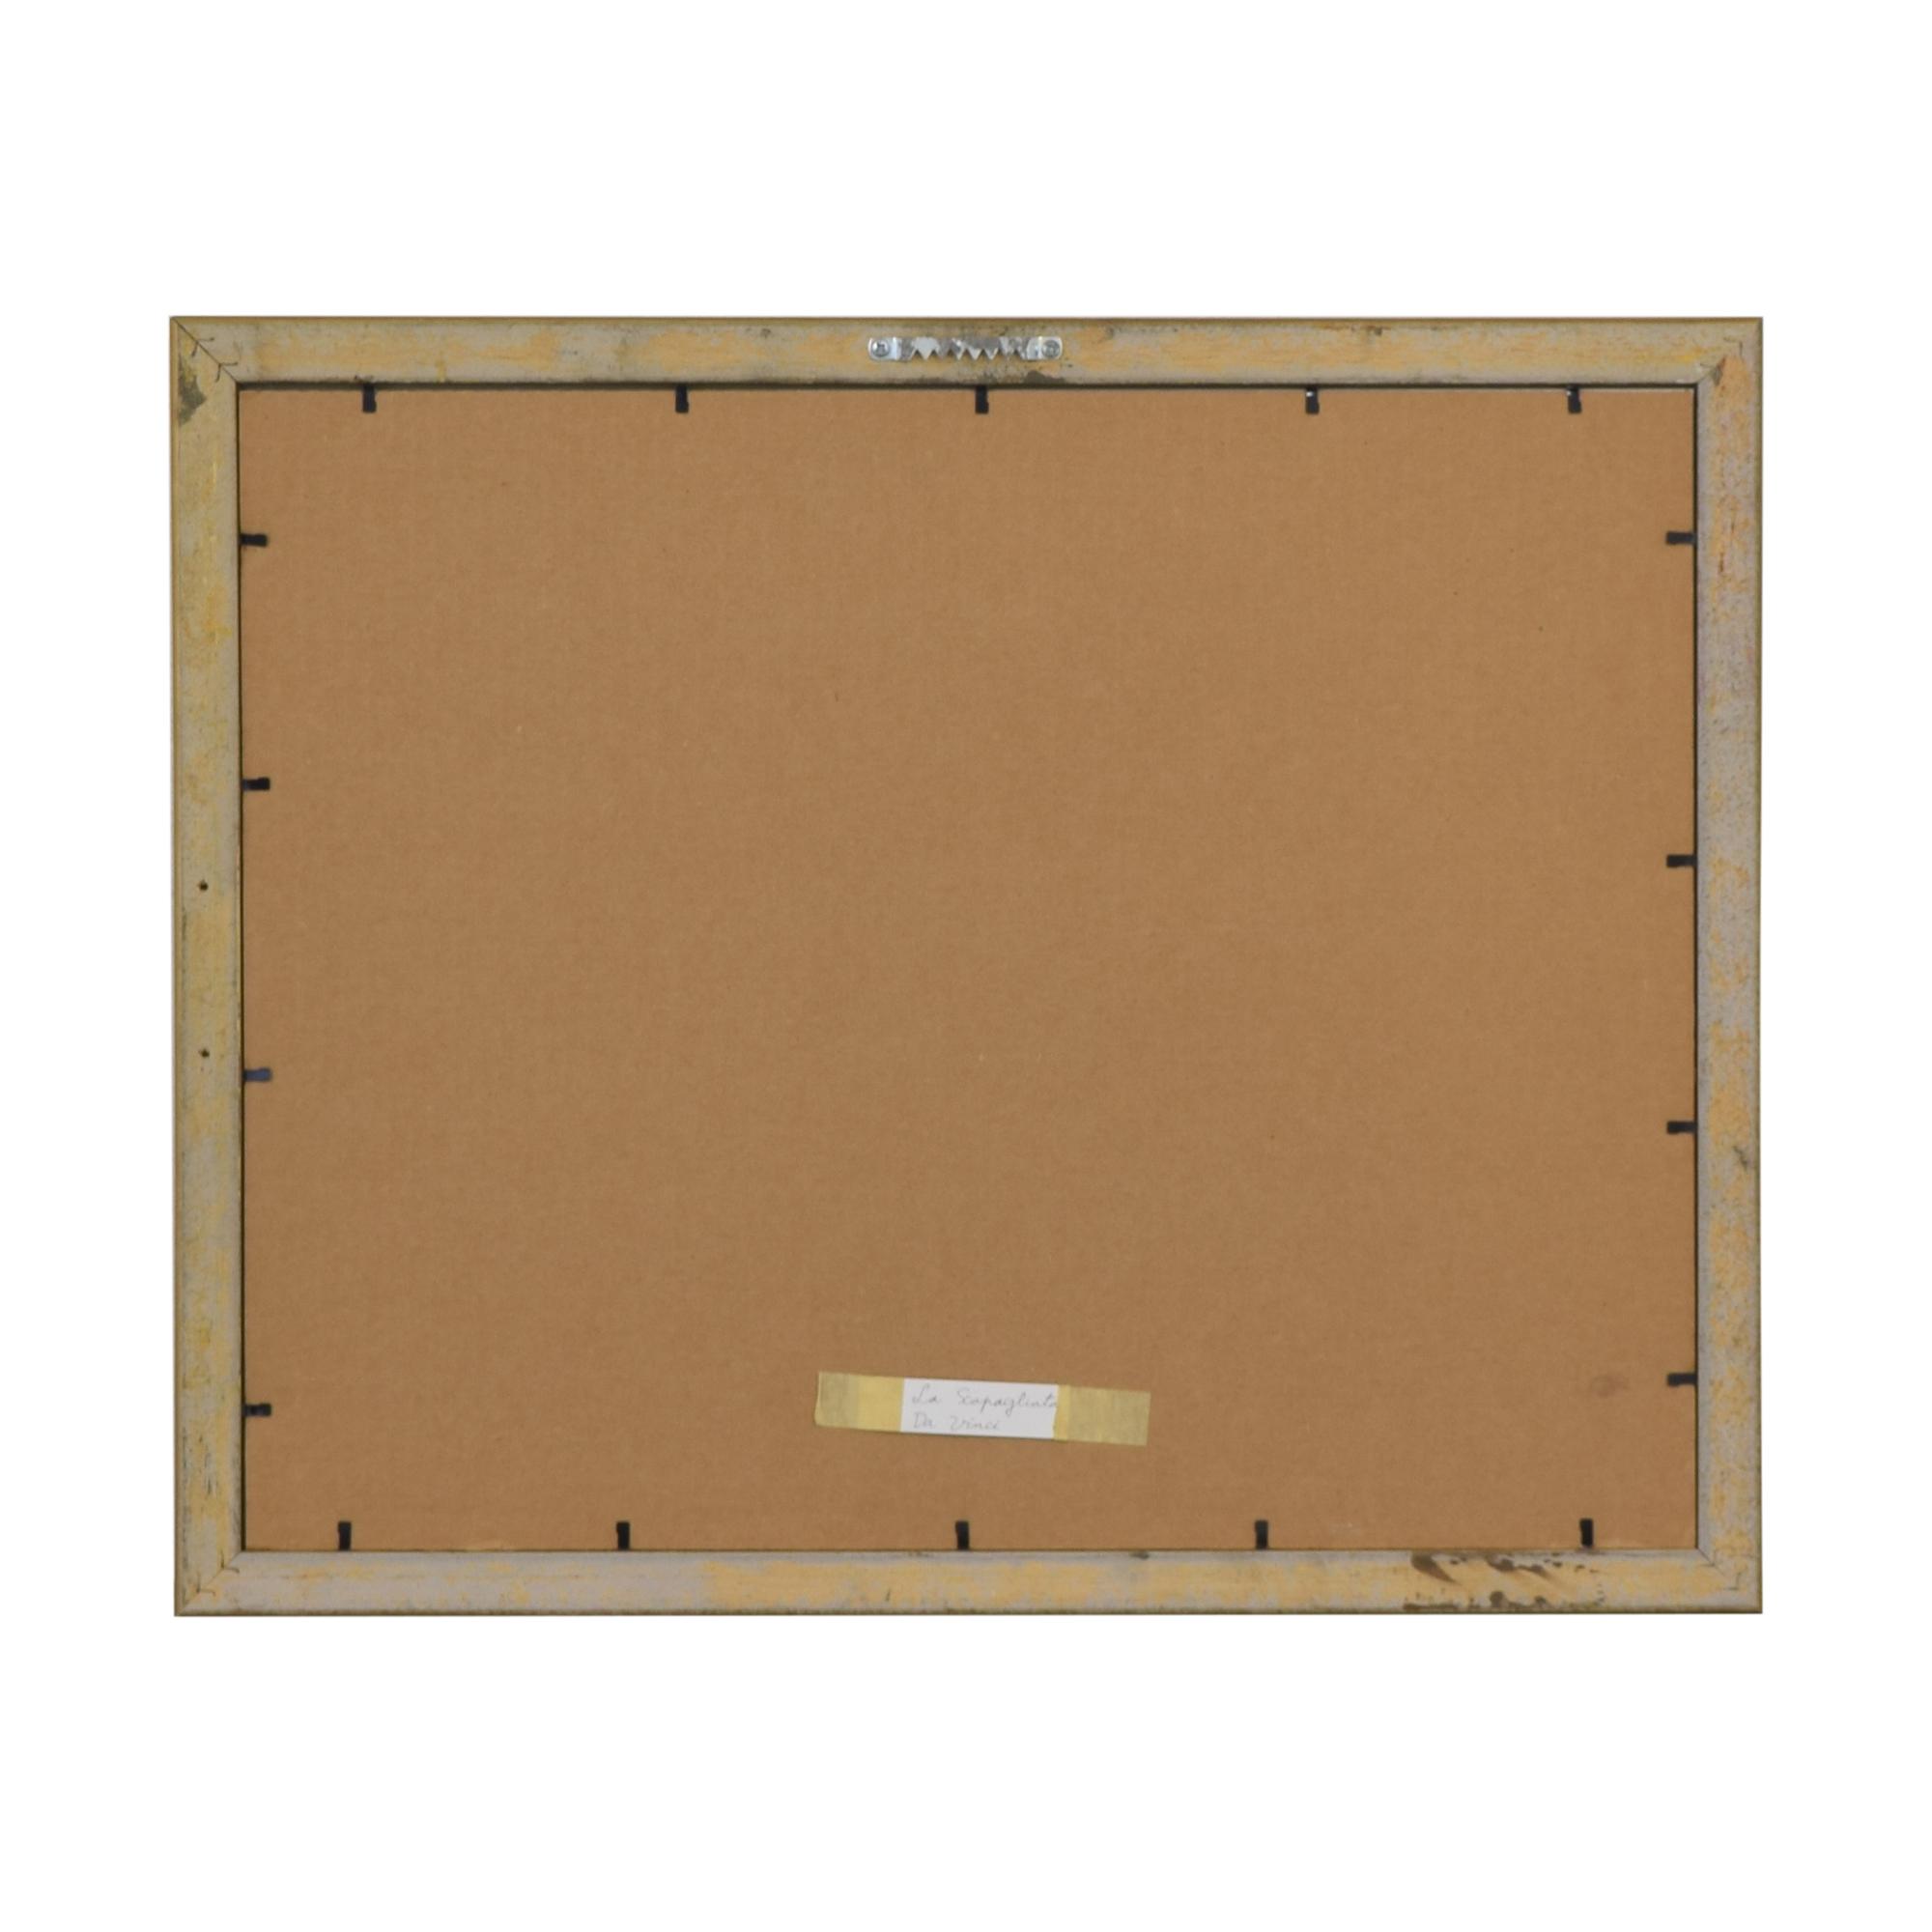 buy Framed La Scapaliata Da Vinci Wall Art